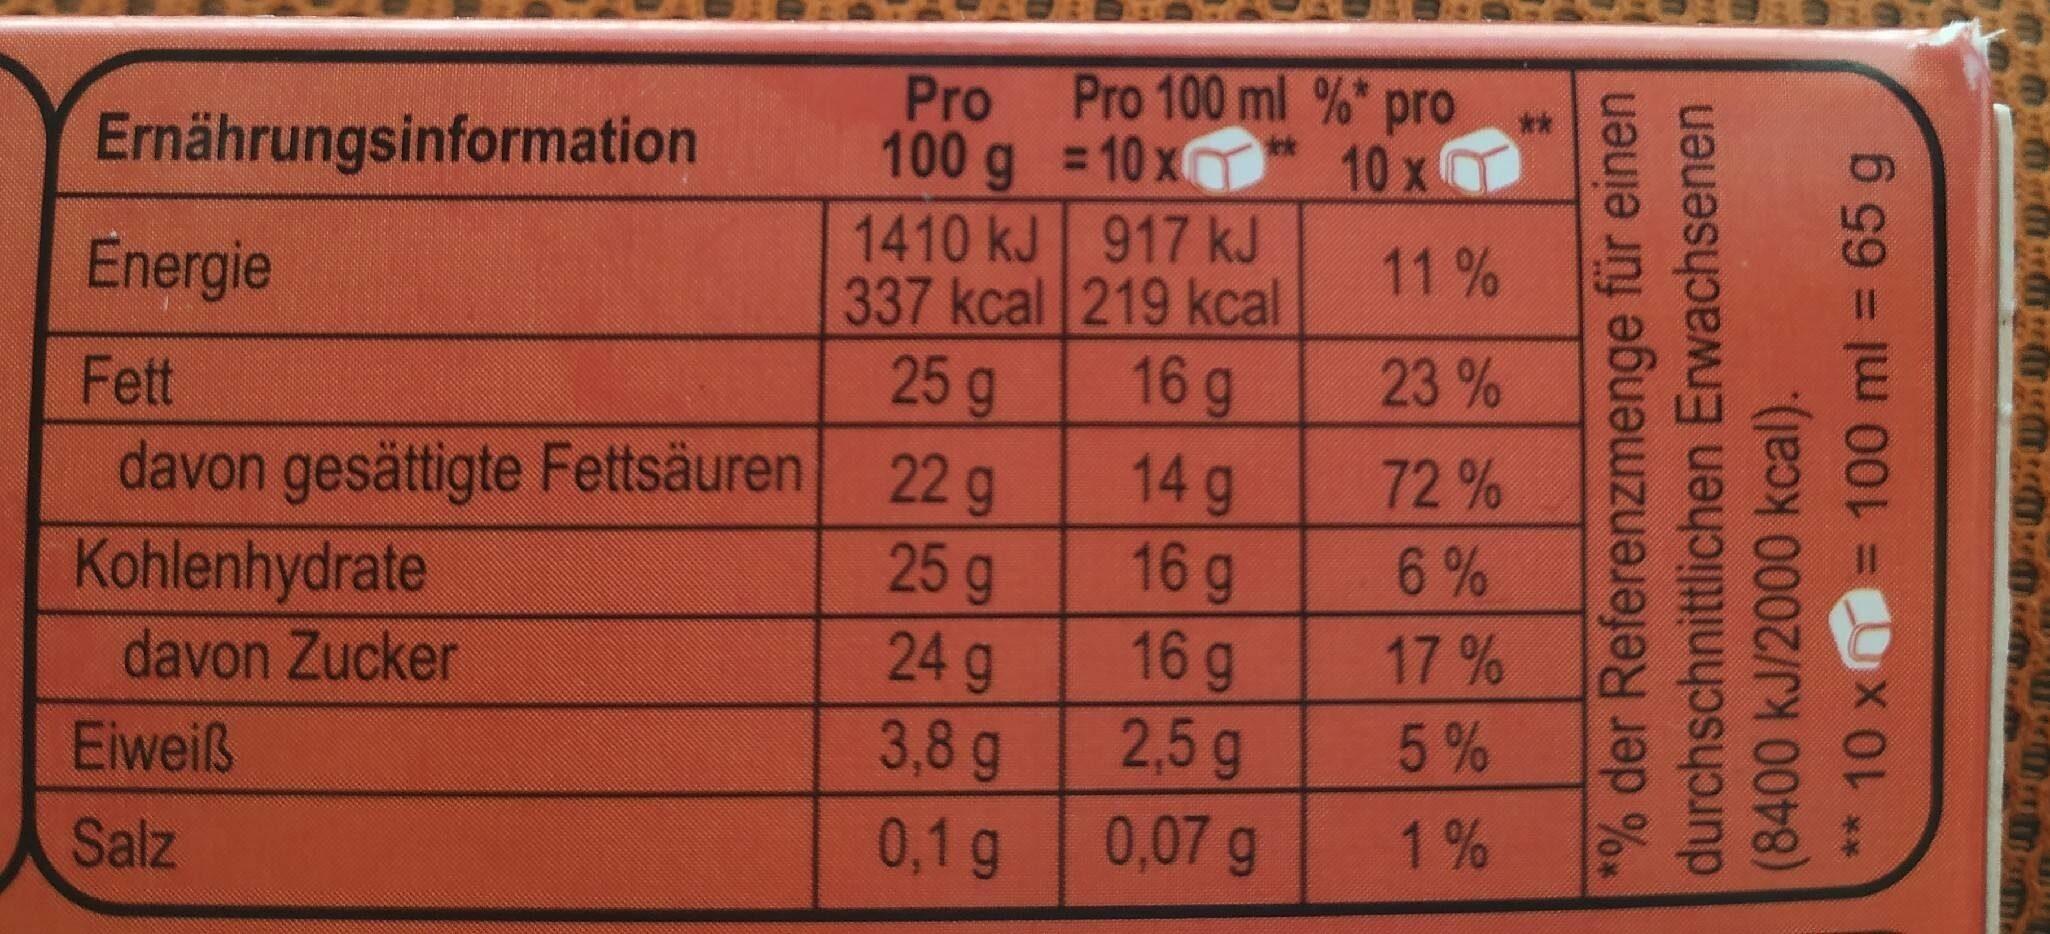 Konfekt erdbeer - Nutrition facts - en